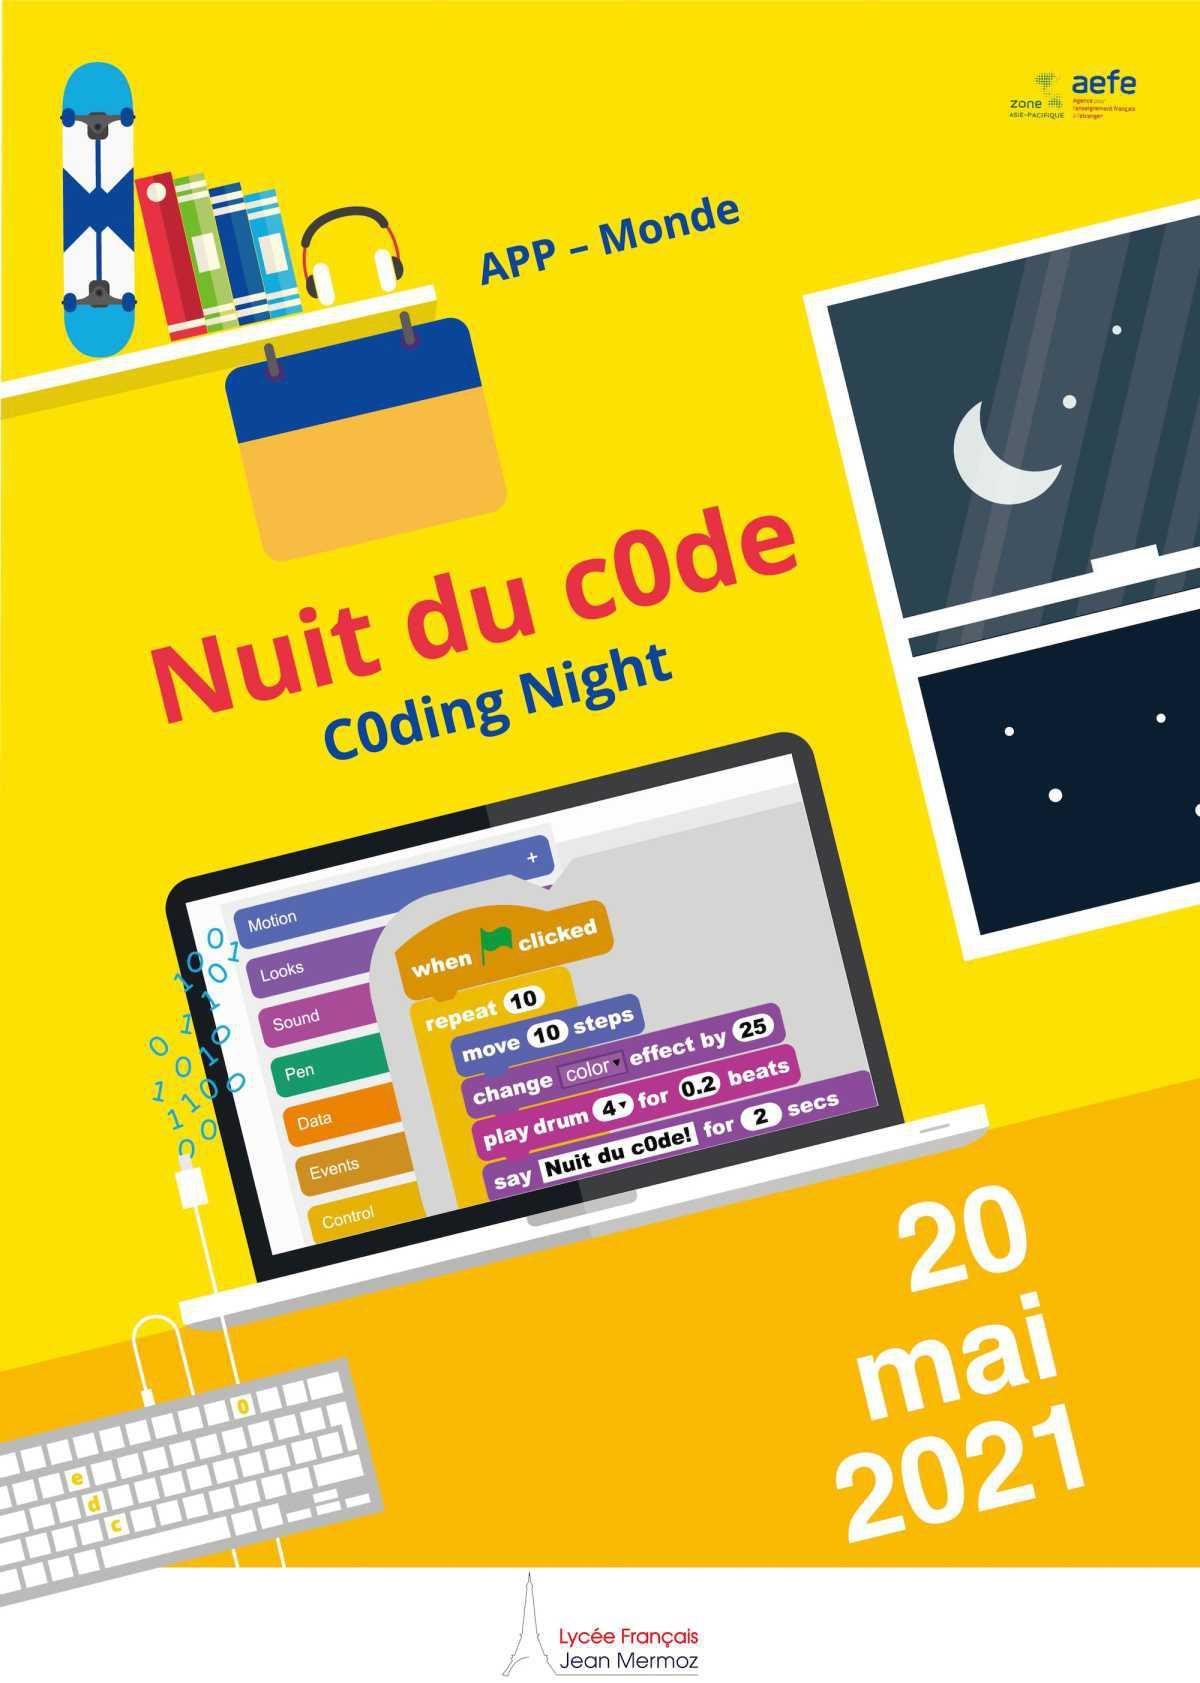 Nuit du c0de - 20 mai 2021